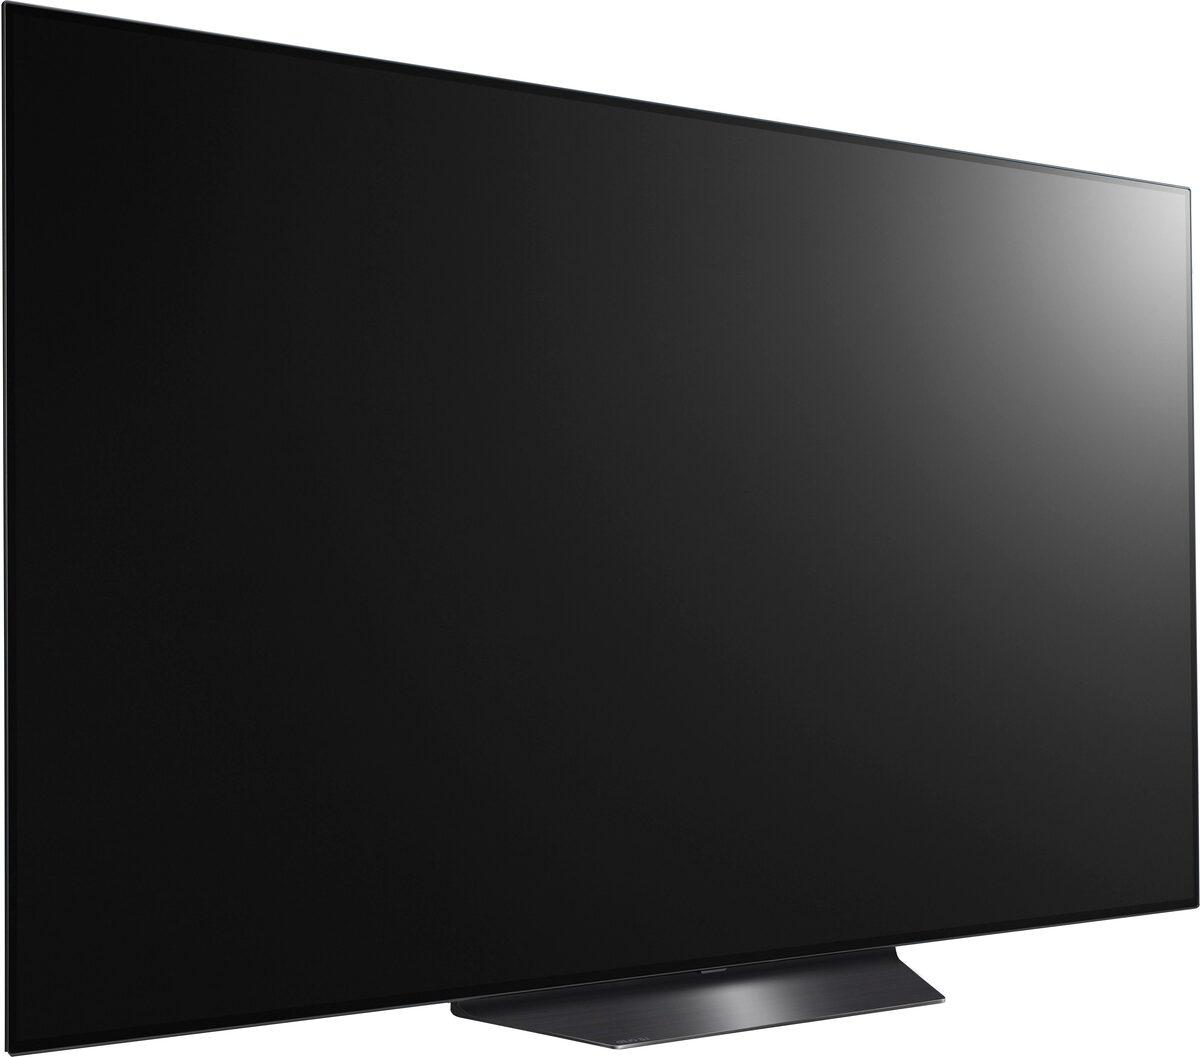 Bild 2 von LG OLED65B9SLA OLED-Fernseher (164 cm/65 Zoll, 4K Ultra HD, Smart-TV)